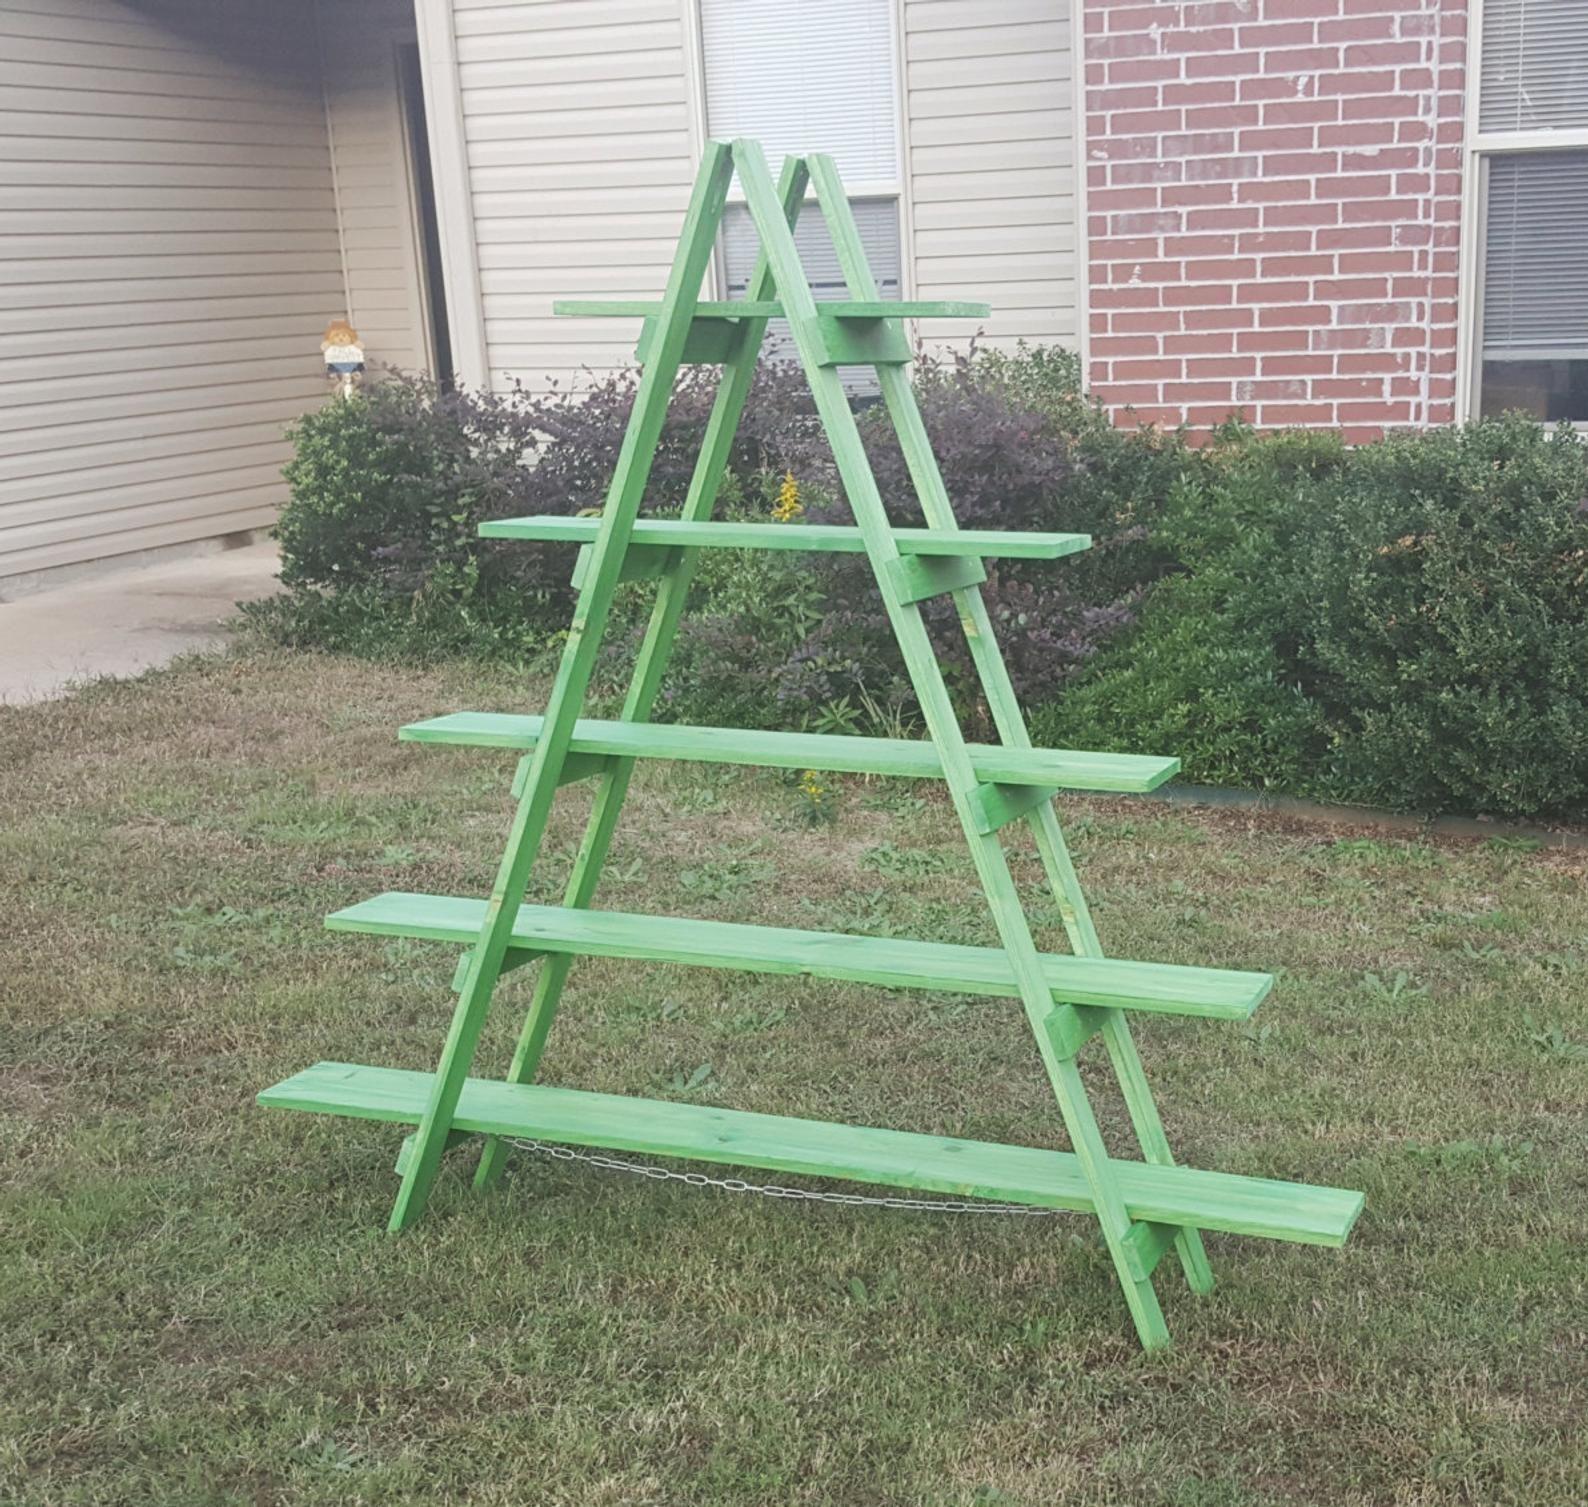 6 Ft Wooden Ladder Christmas Village Display Craft Show Display Portable Display Display Stand Trade Show Display Wooden Shelves Christmas Village Display Craft Fair Displays Christmas Display